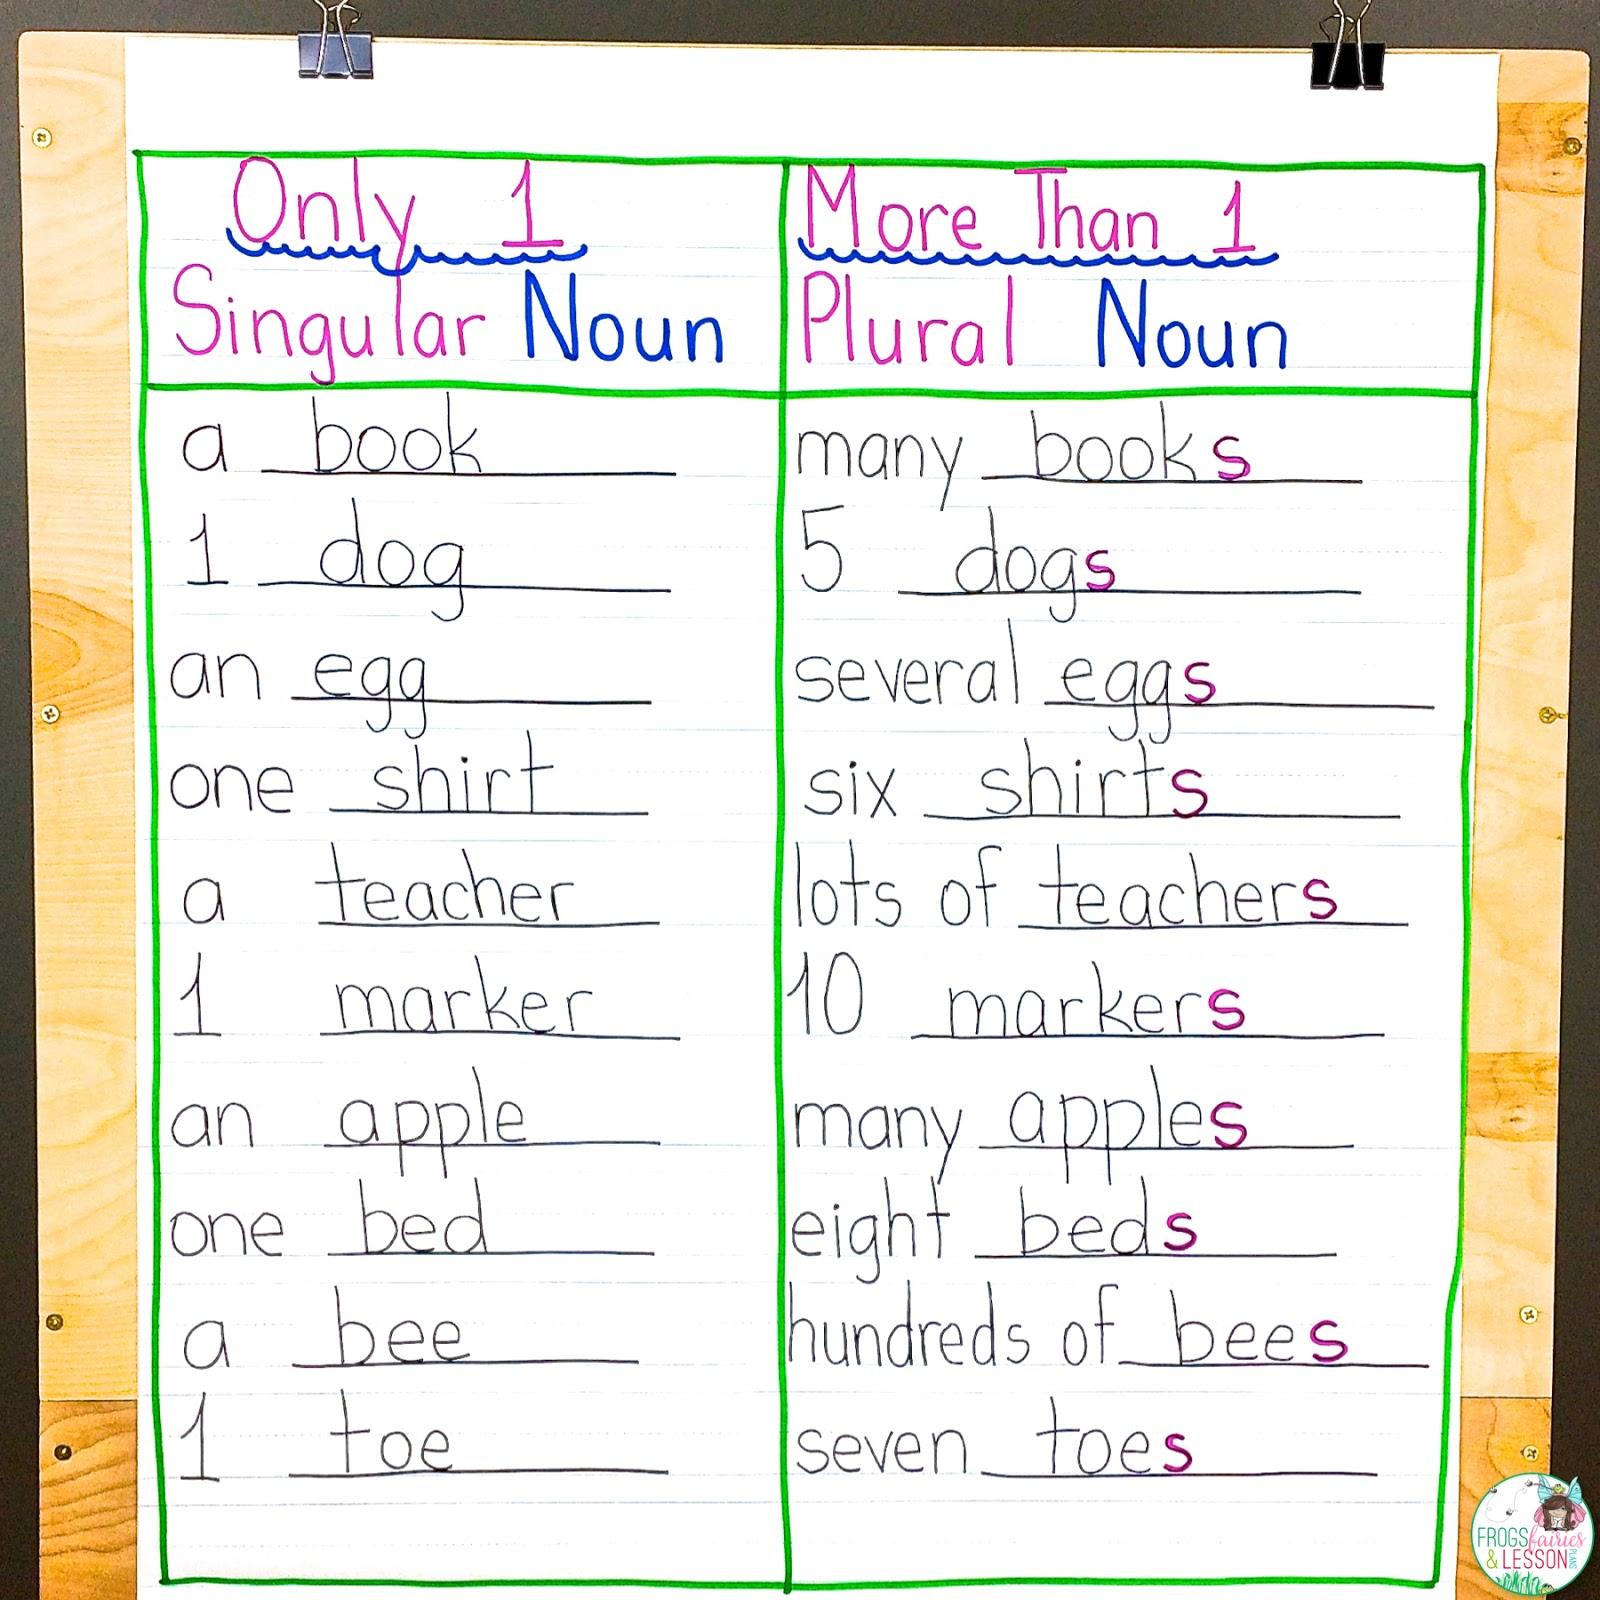 Singular and Plural Nouns Anchor Chart